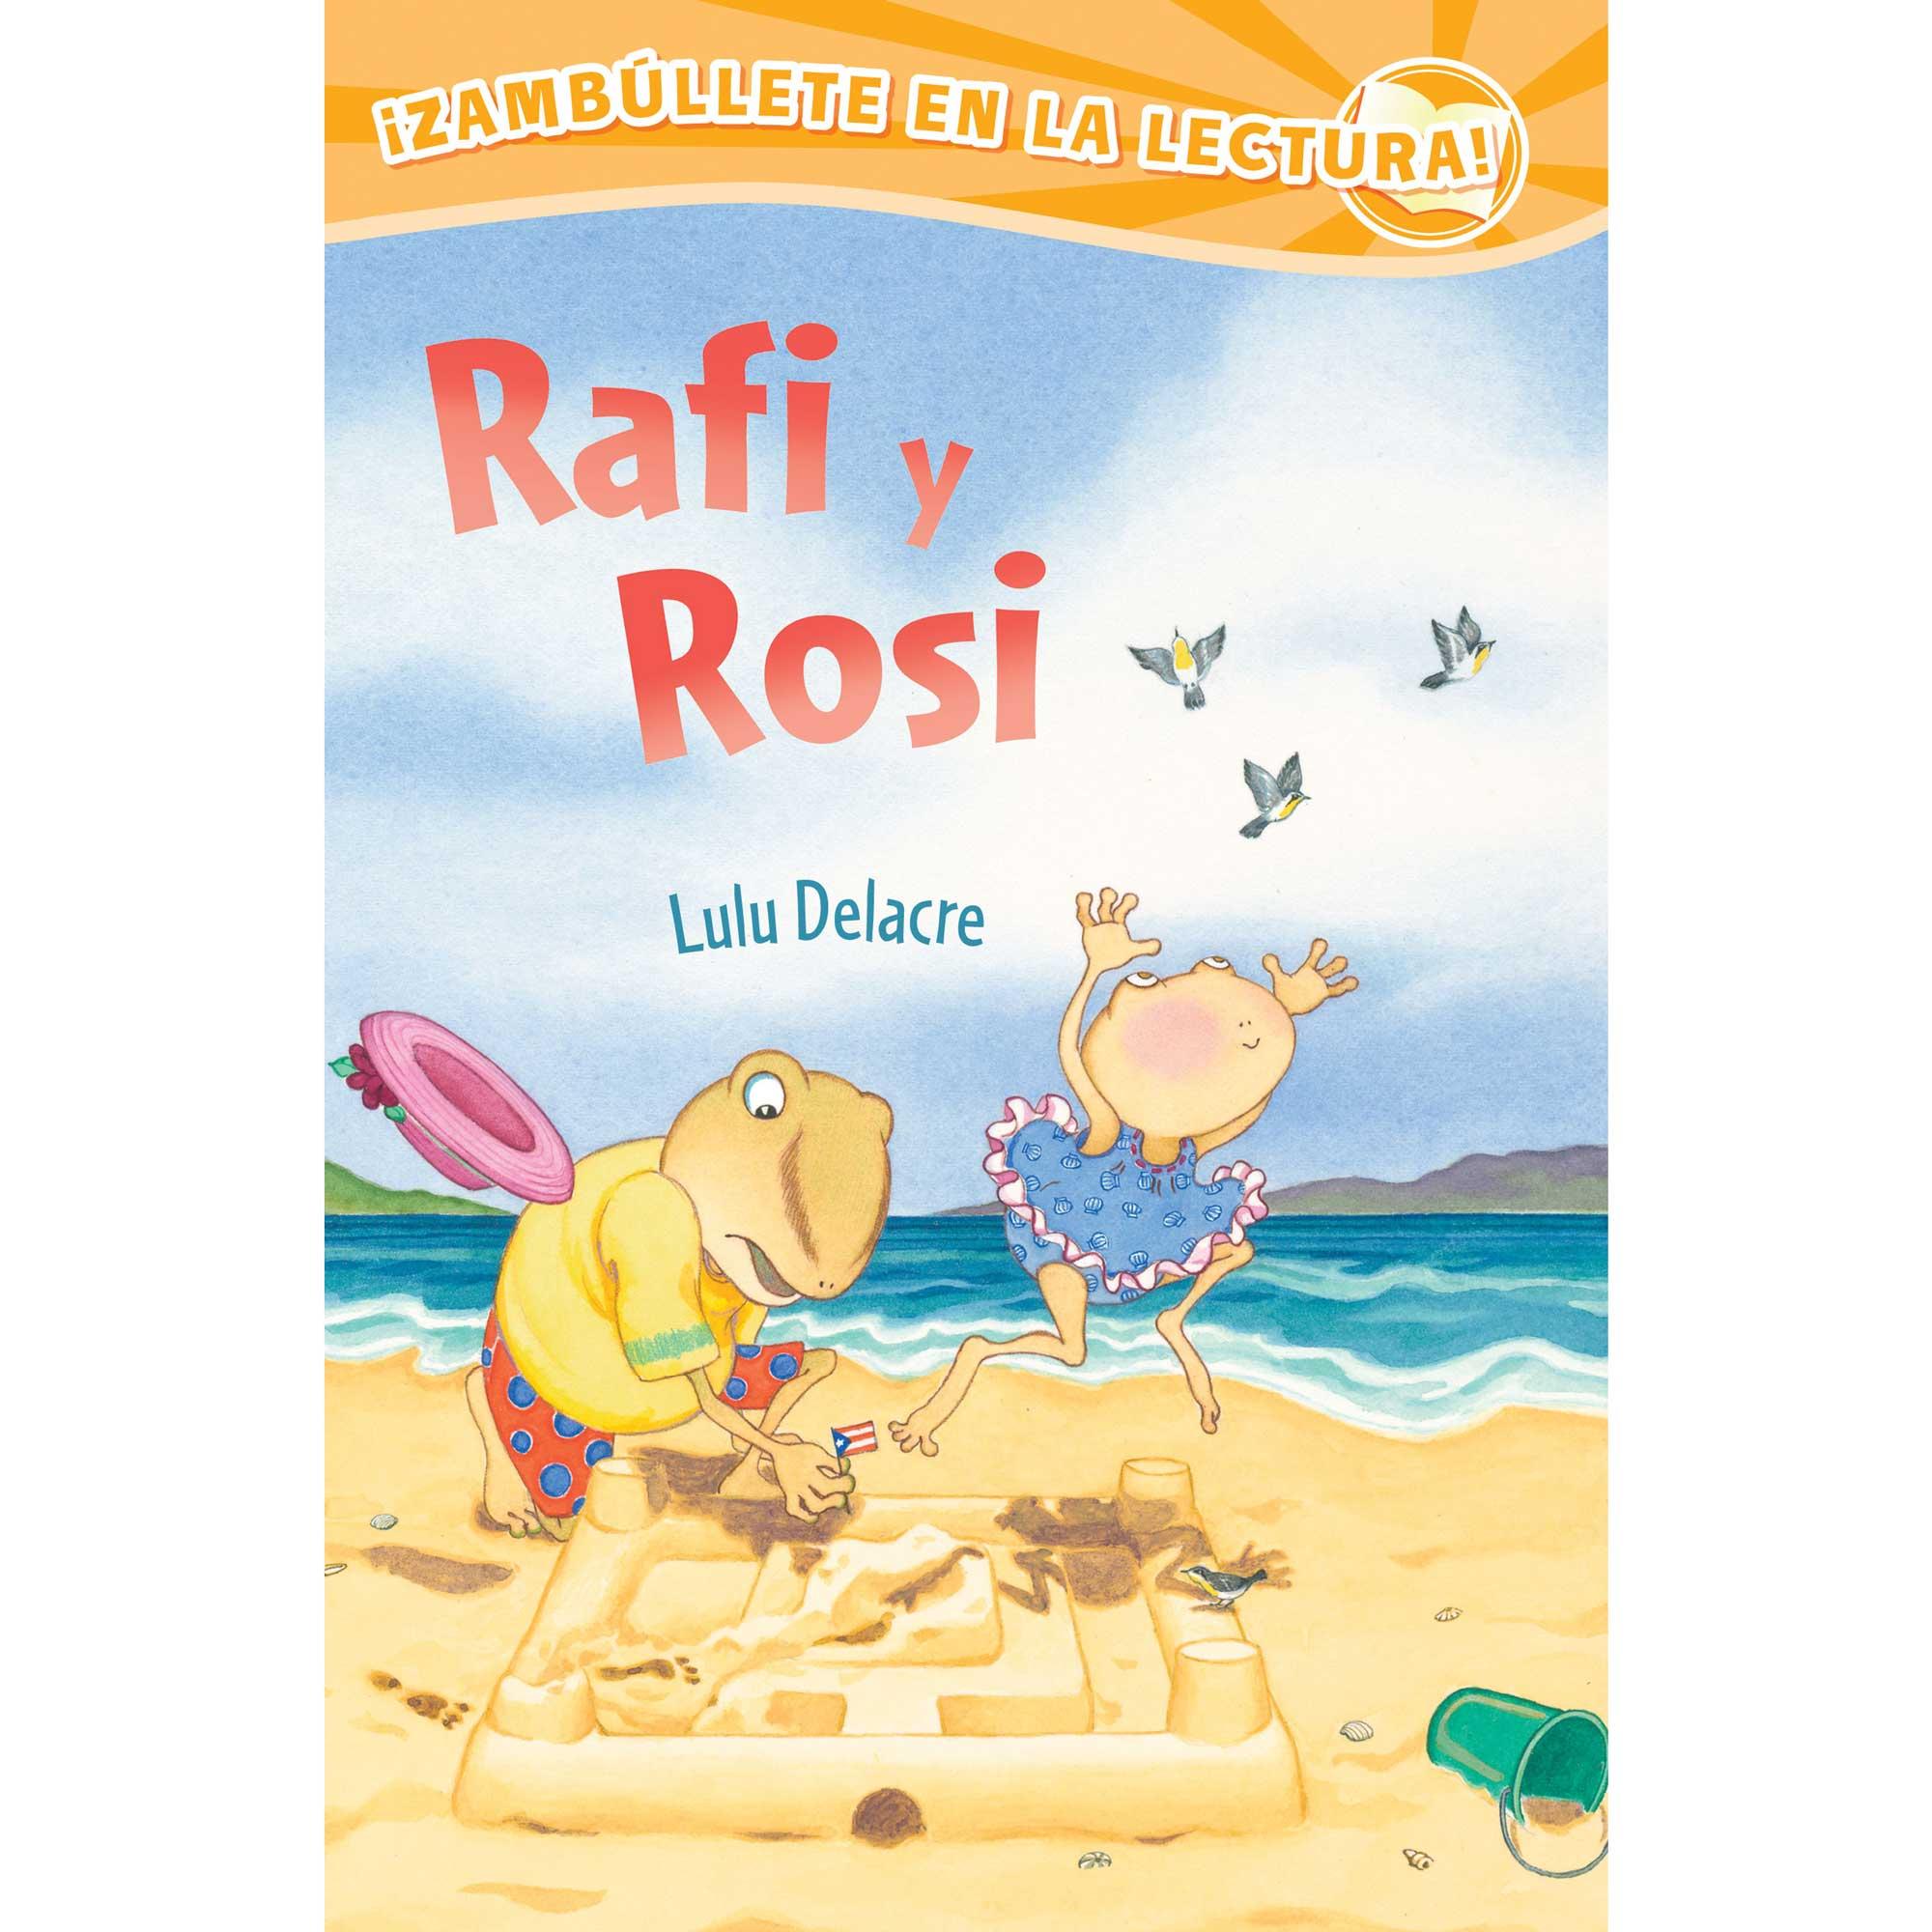 Rafi y Rosi by Lulu Delacre